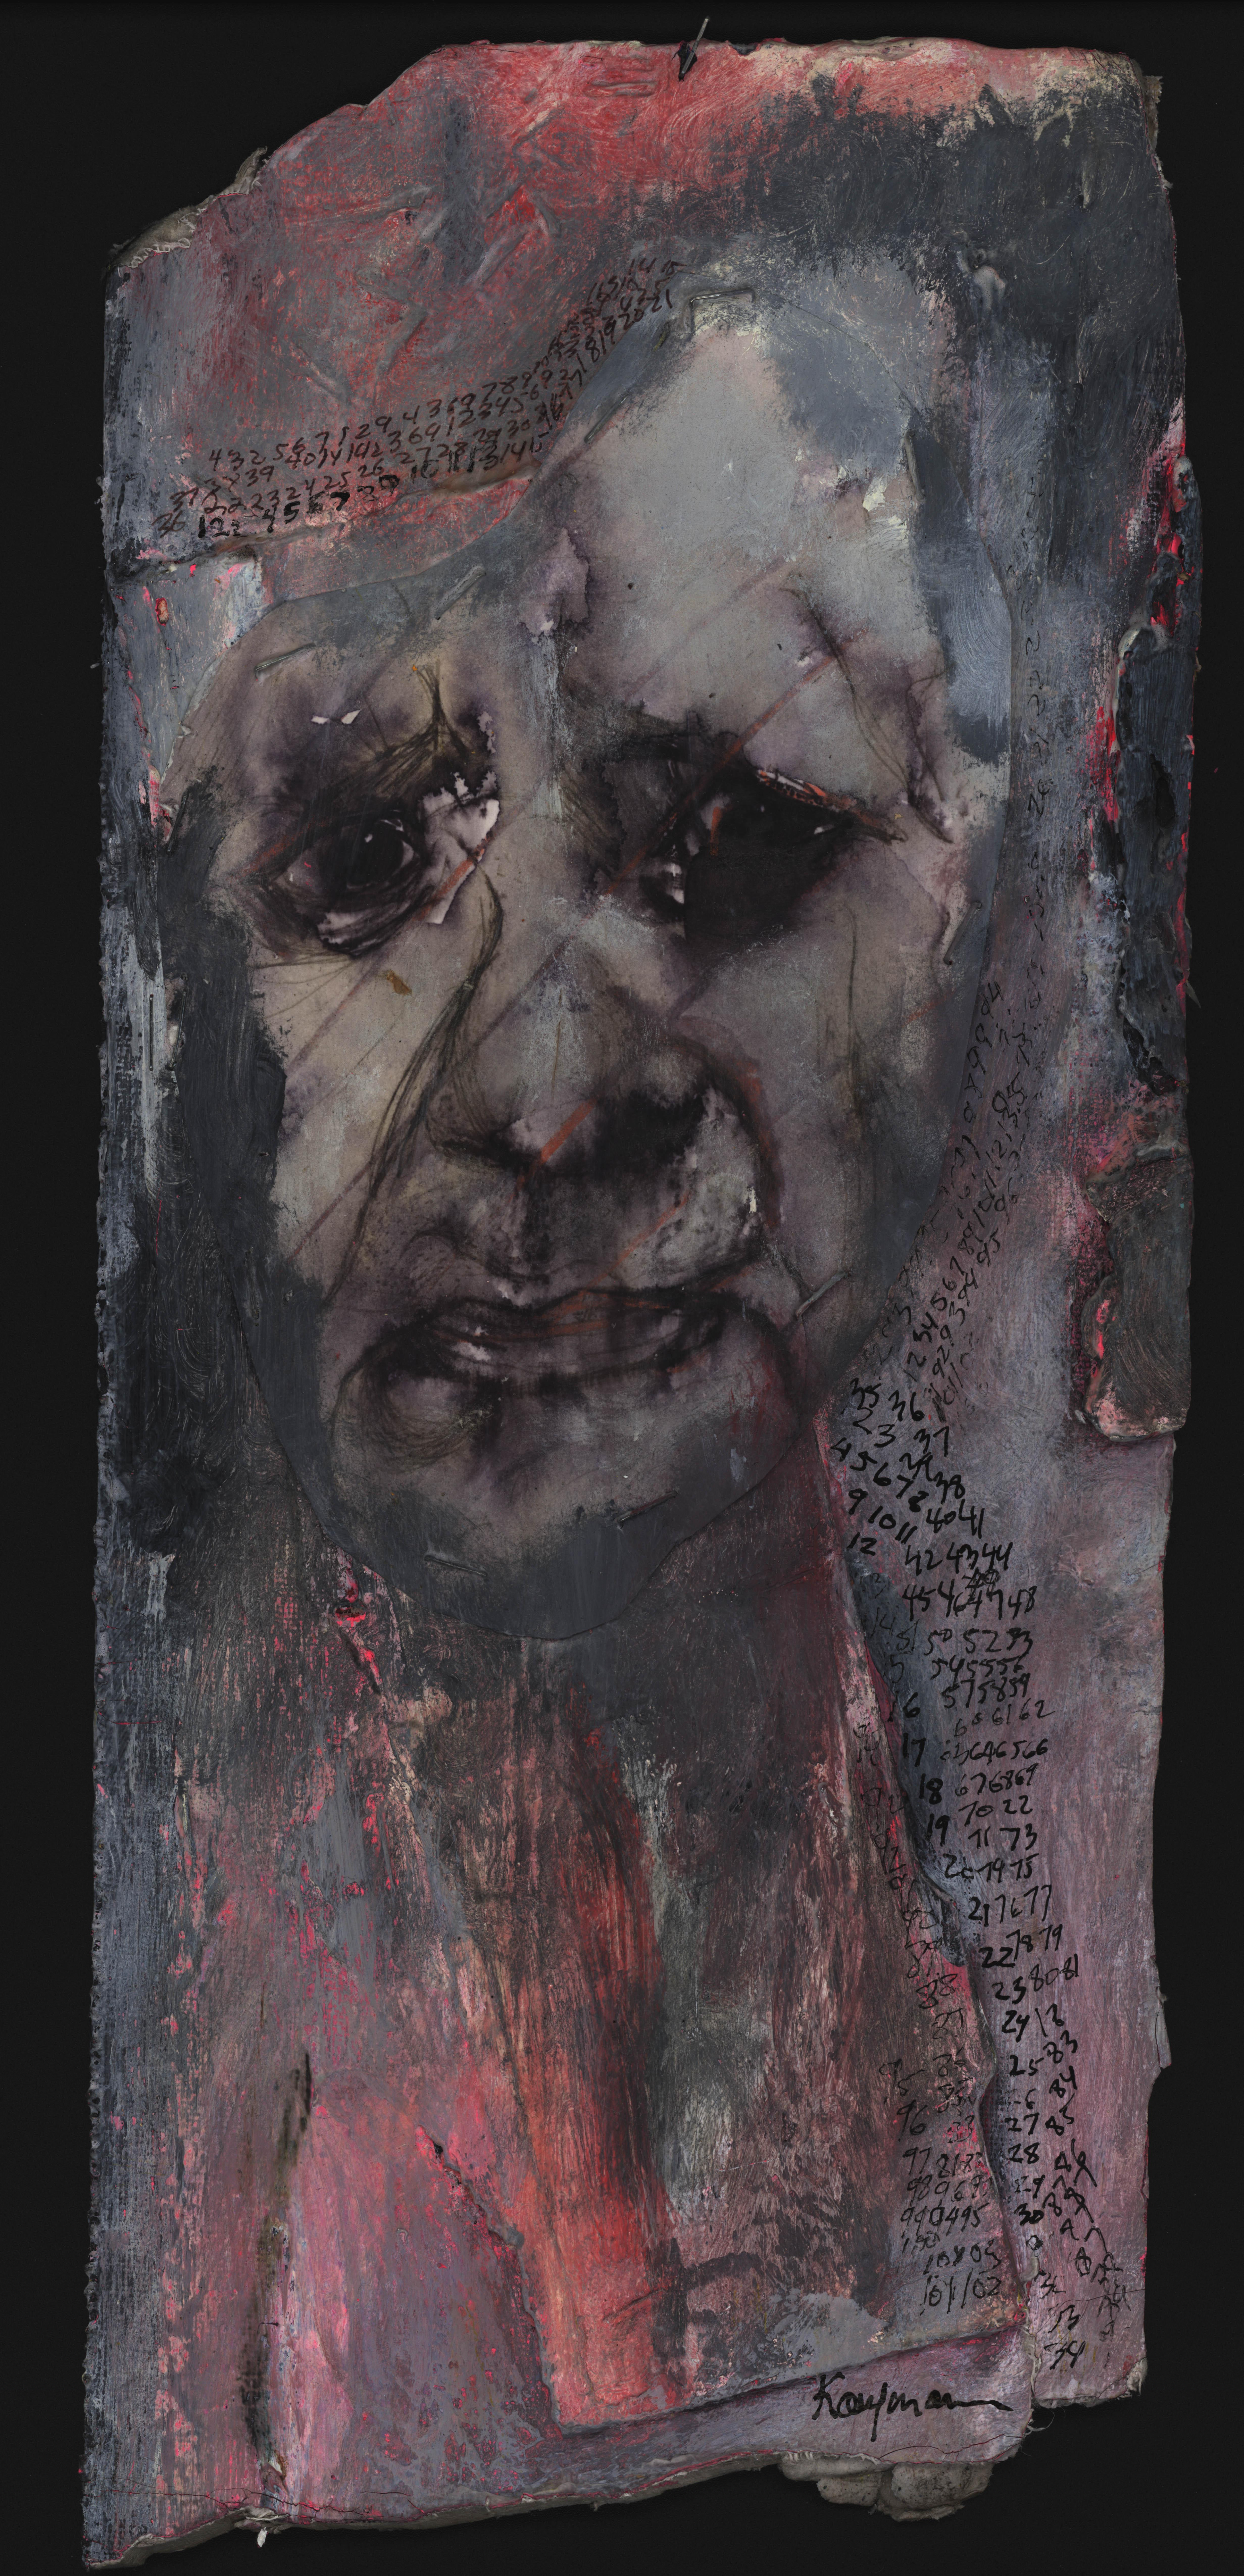 Untitled painting (4), undated